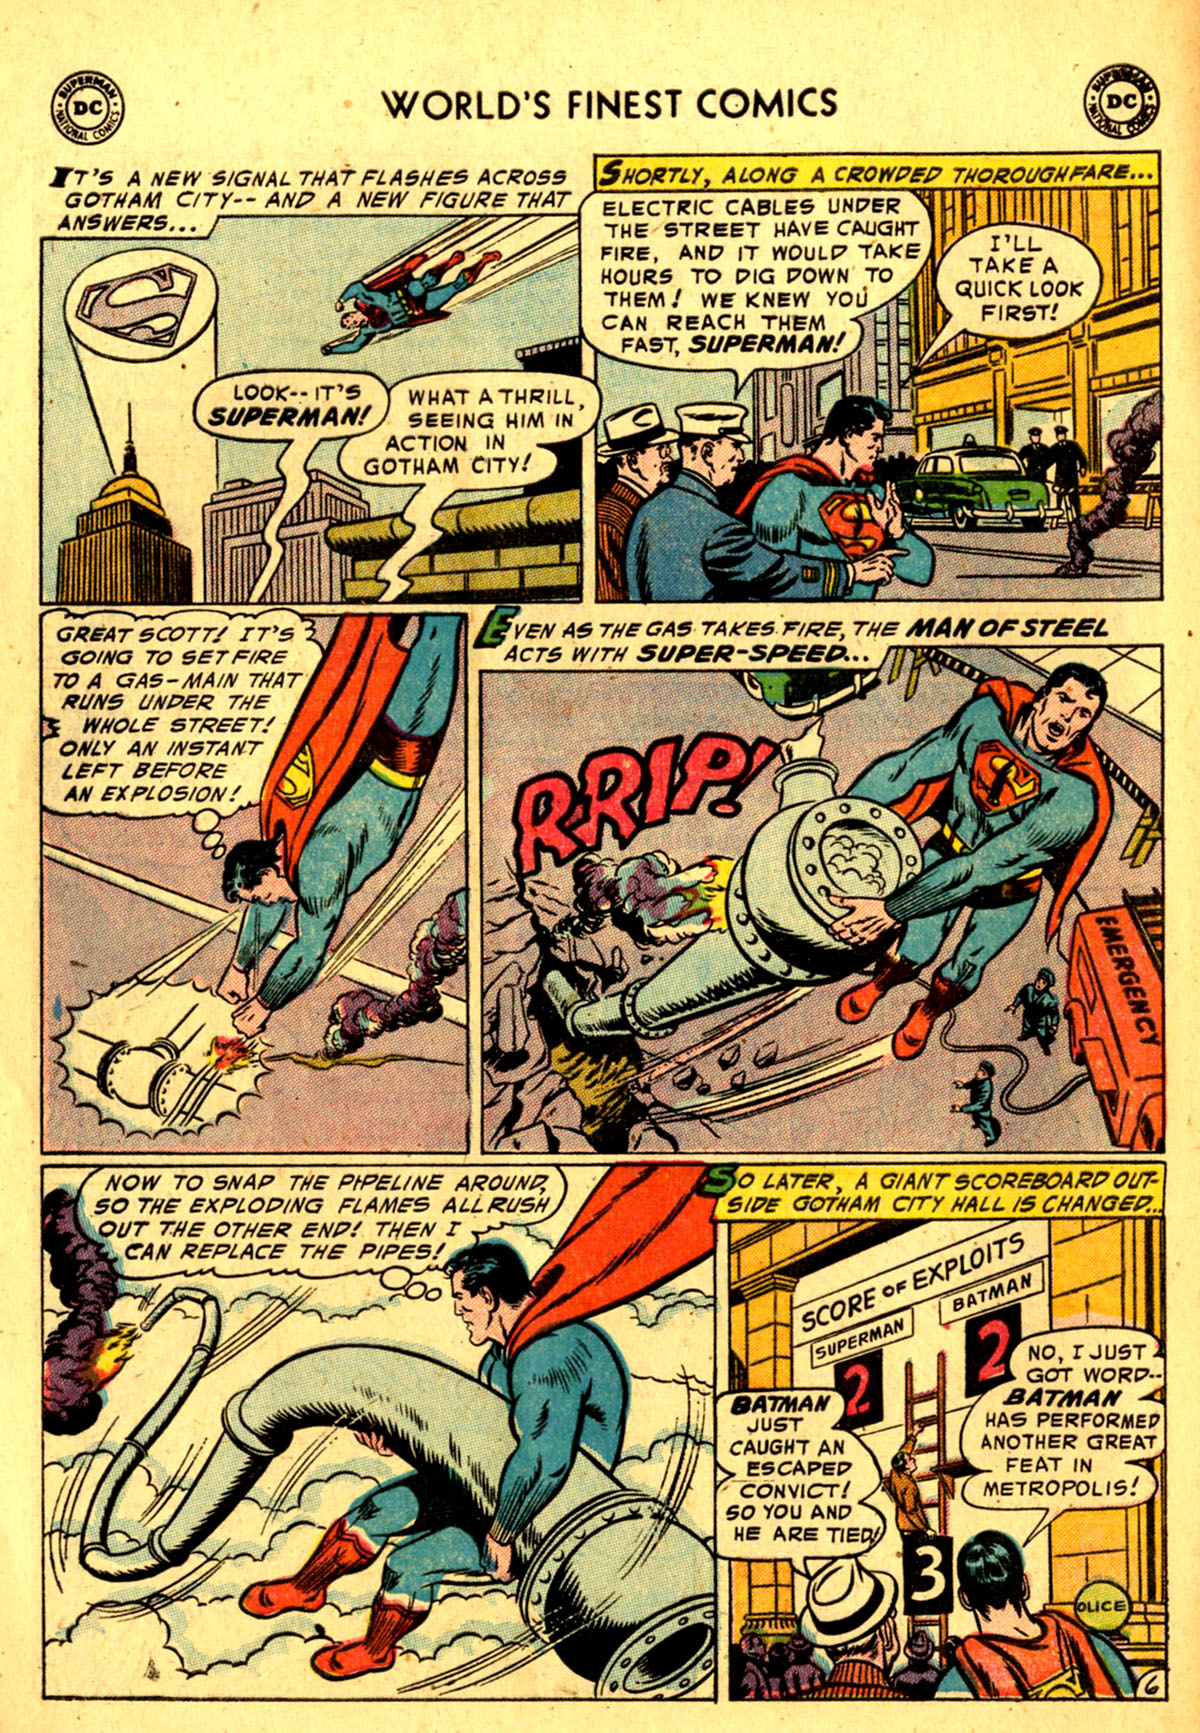 Read online World's Finest Comics comic -  Issue #76 - 8